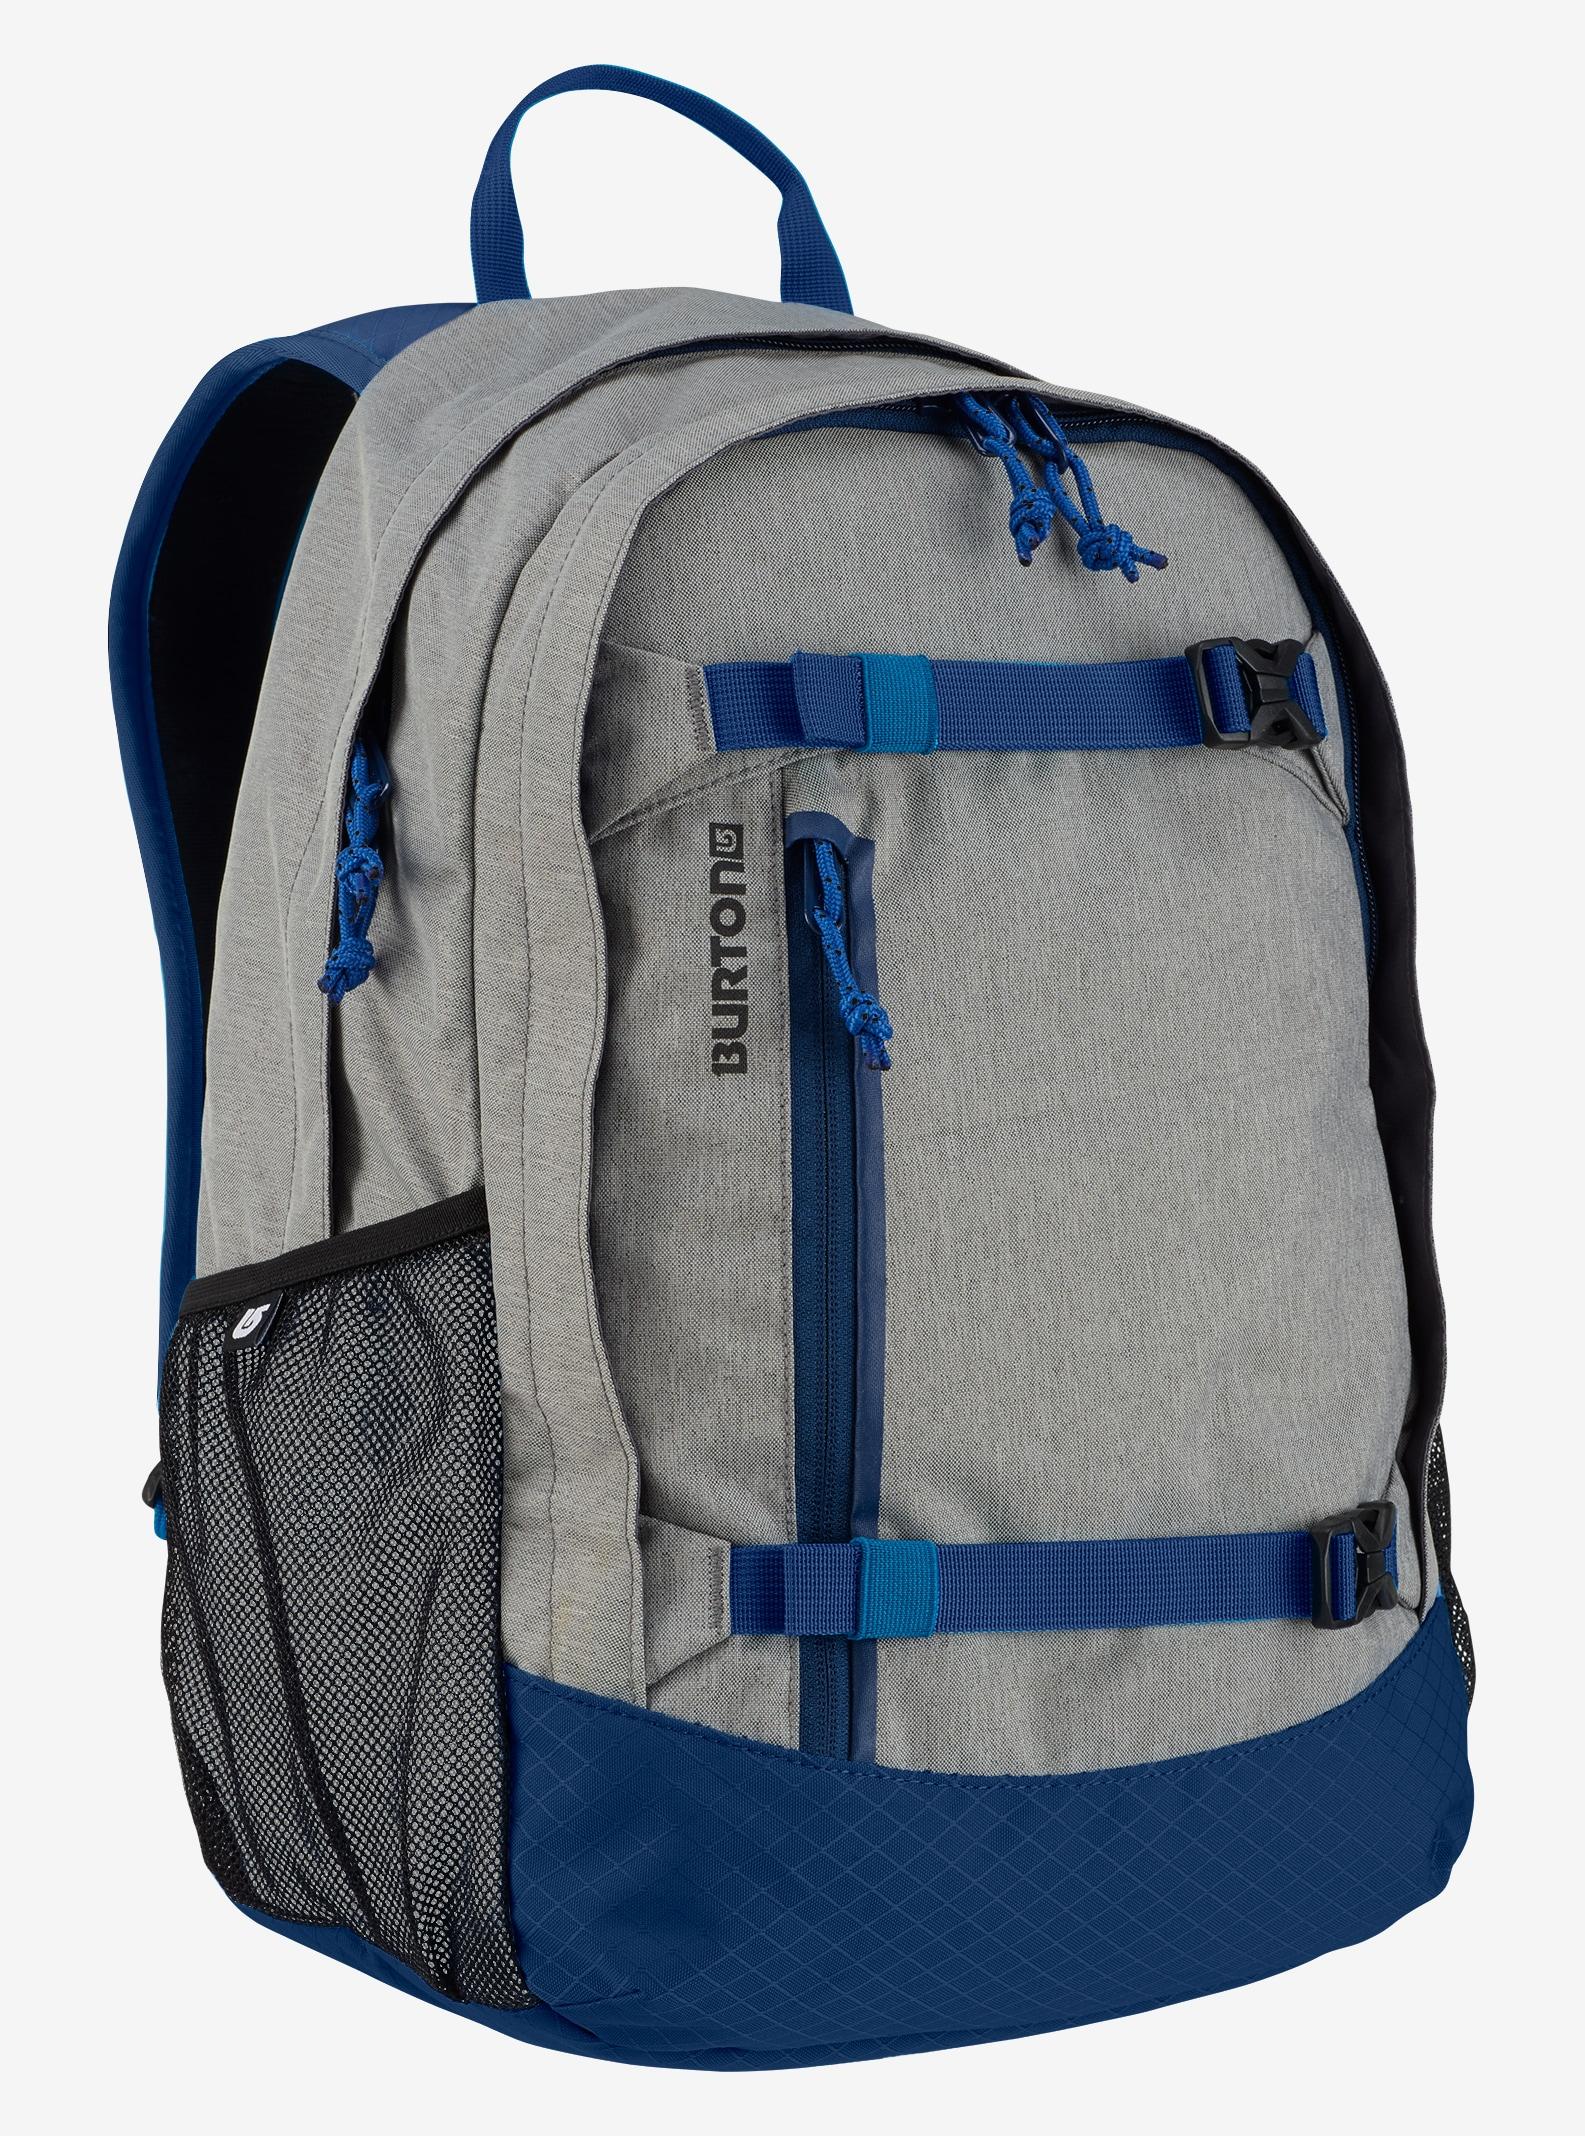 Burton Kids' Day Hiker 20L Backpack shown in Dark Ash Heather